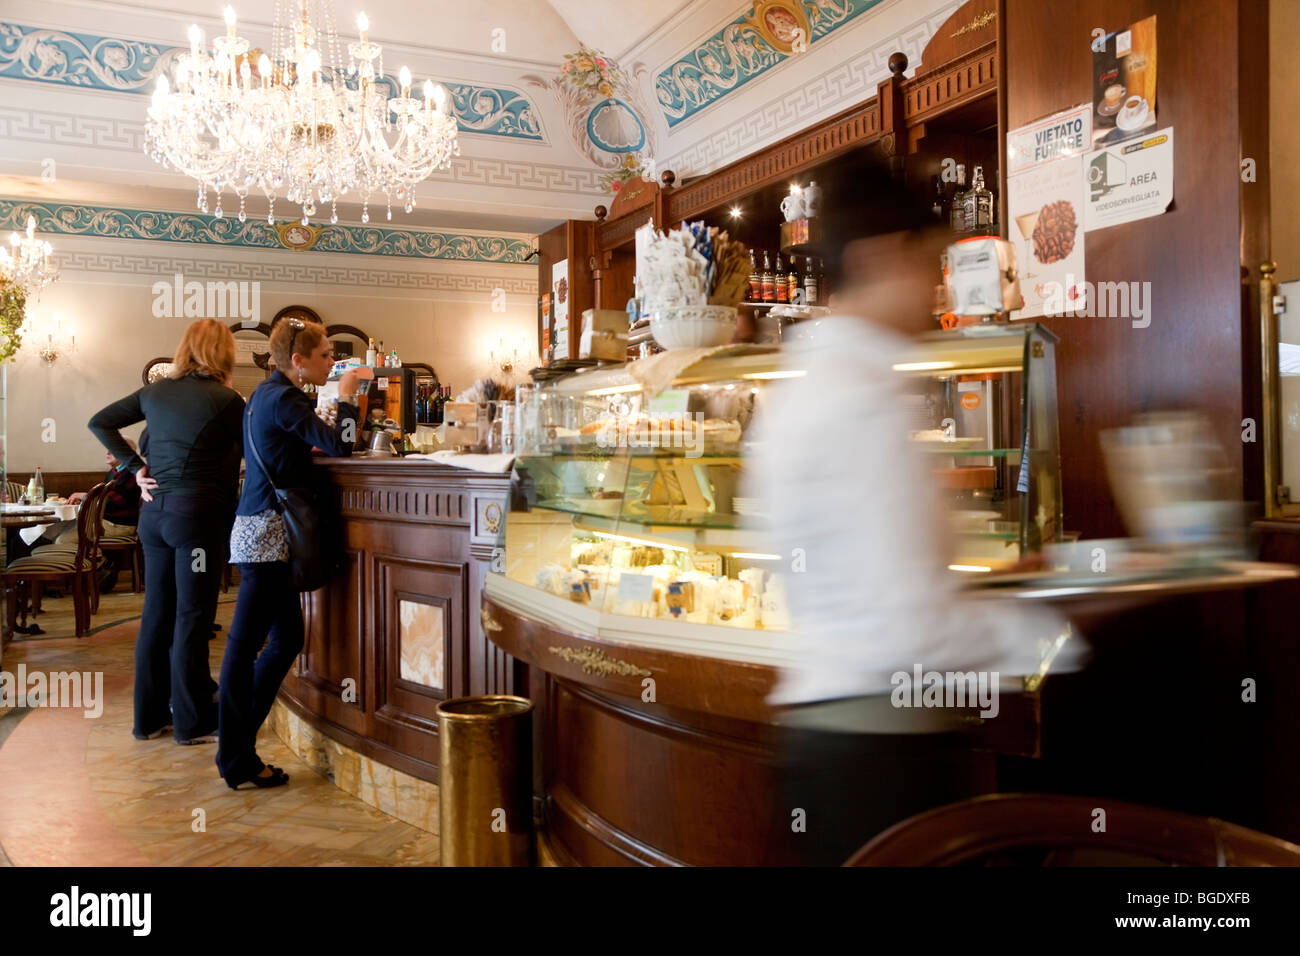 Cafe, Parma, Emilia Romagna, Italy - Stock Image